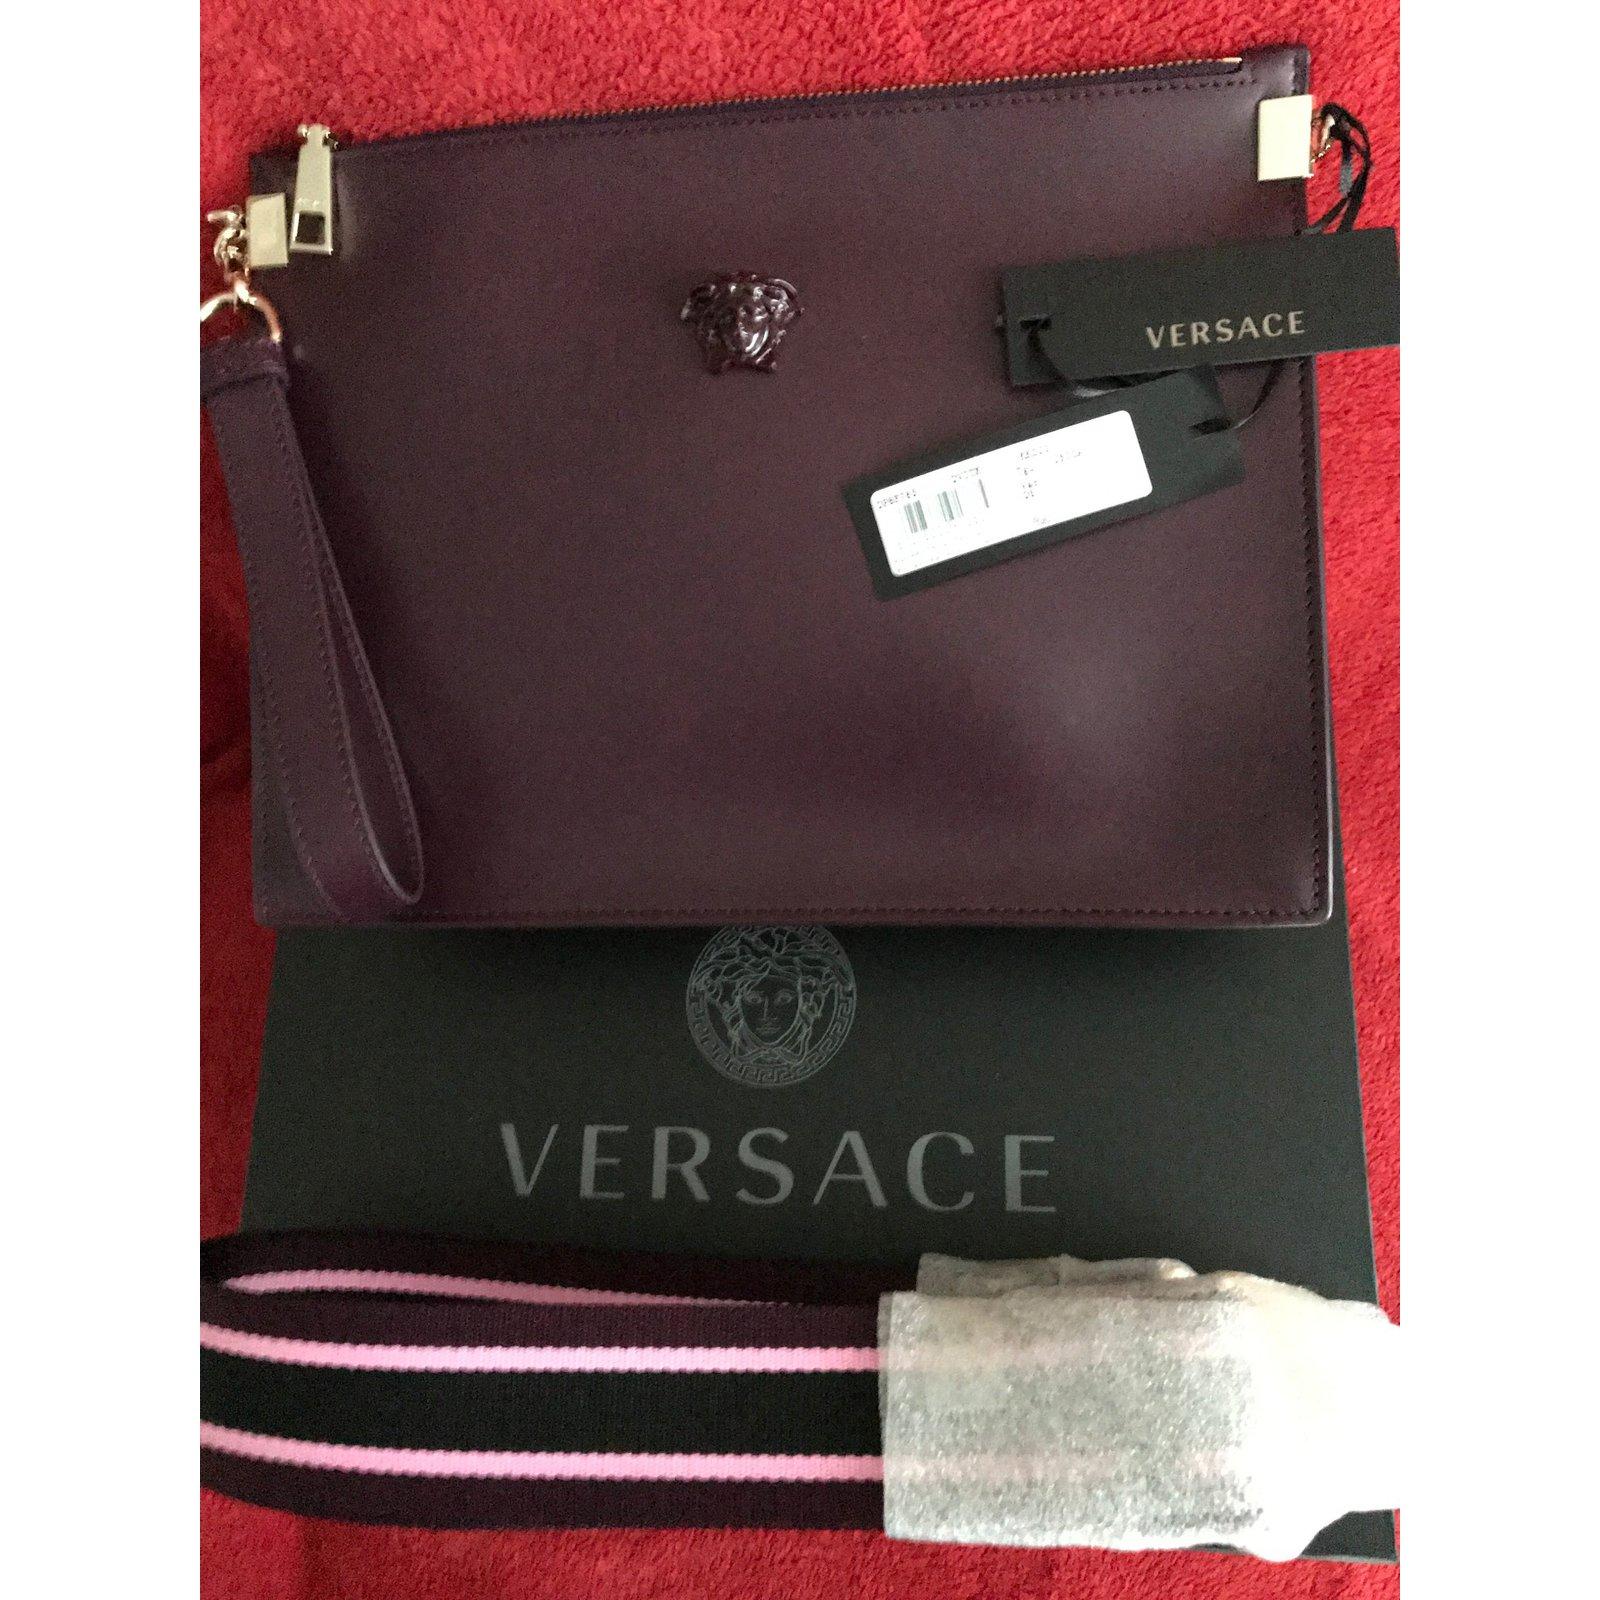 Gianni Versace VERSACE MEDUSA CALF LEATHER POUCH - burgungy All new  Handbags Leather Dark brown ref.58232 - Joli Closet e4240851bcfc8